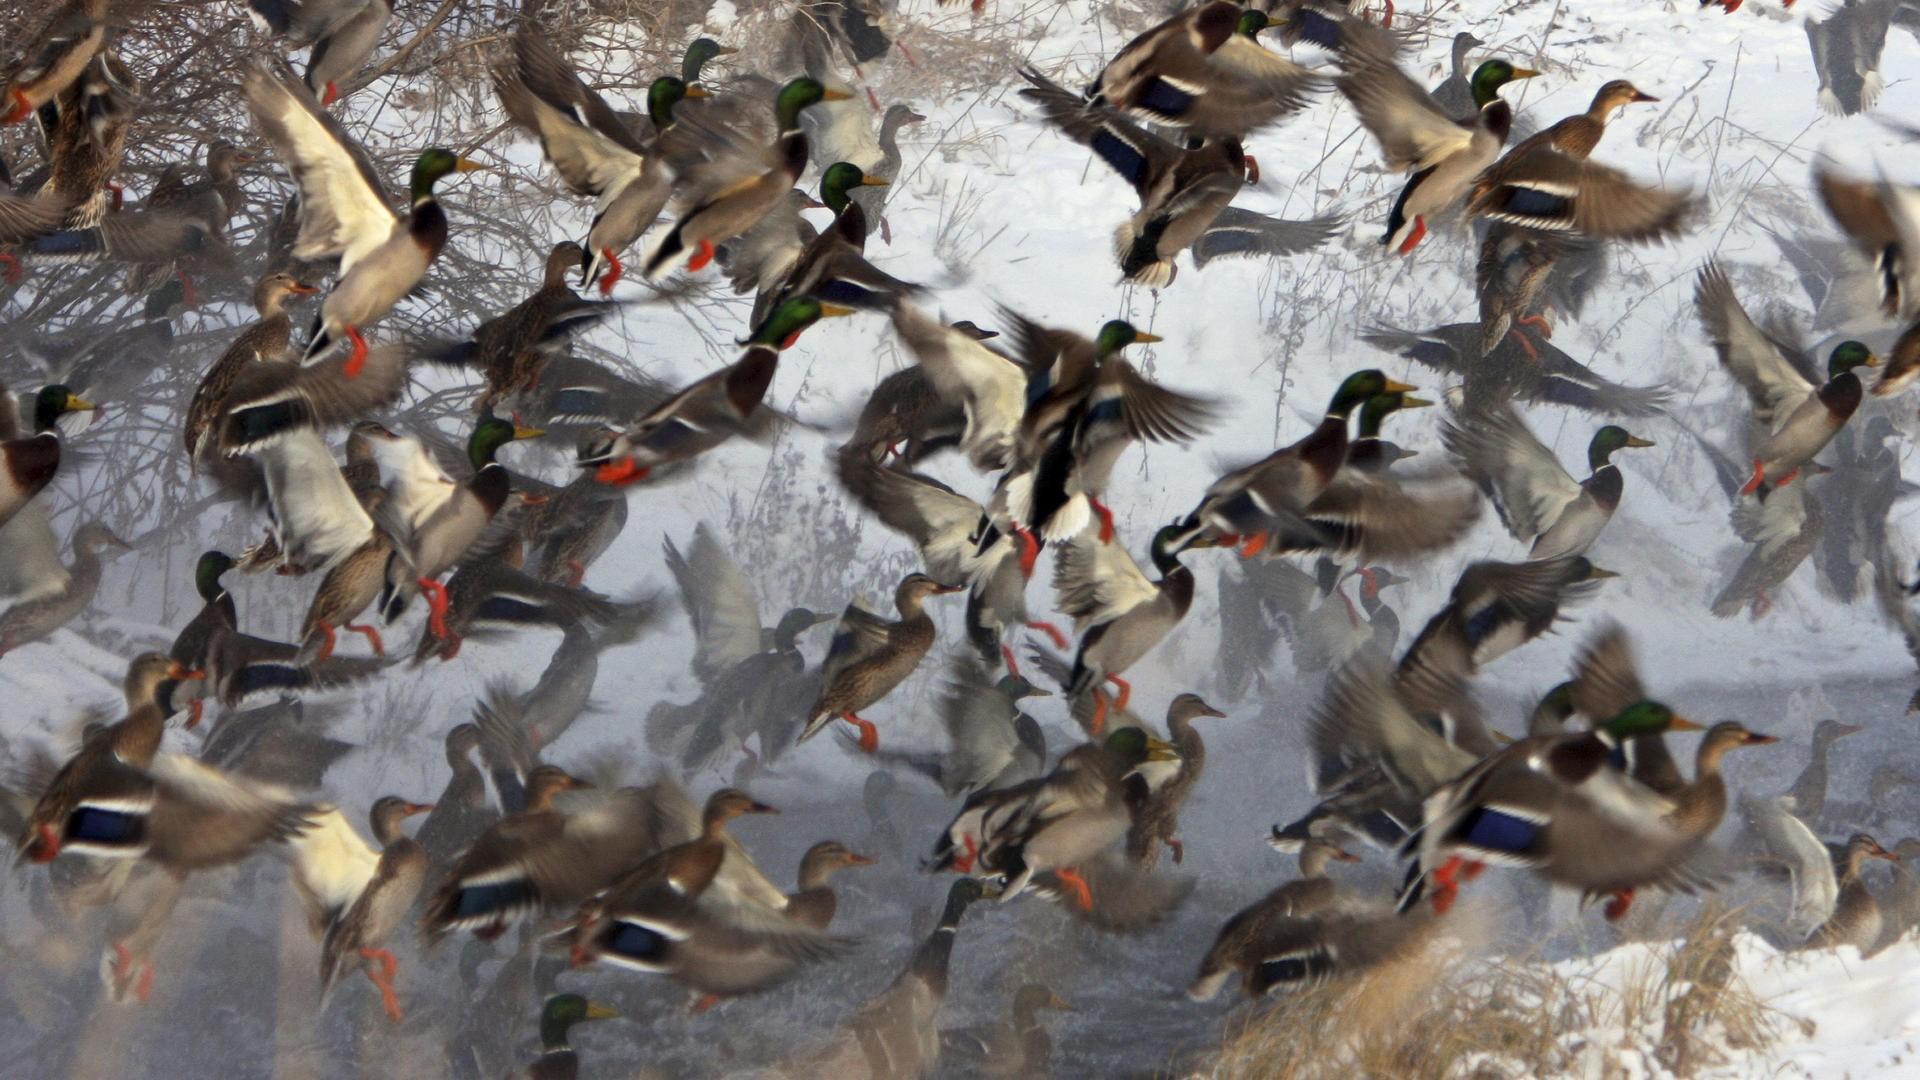 duck Wallpaper Background 3223 1920x1080